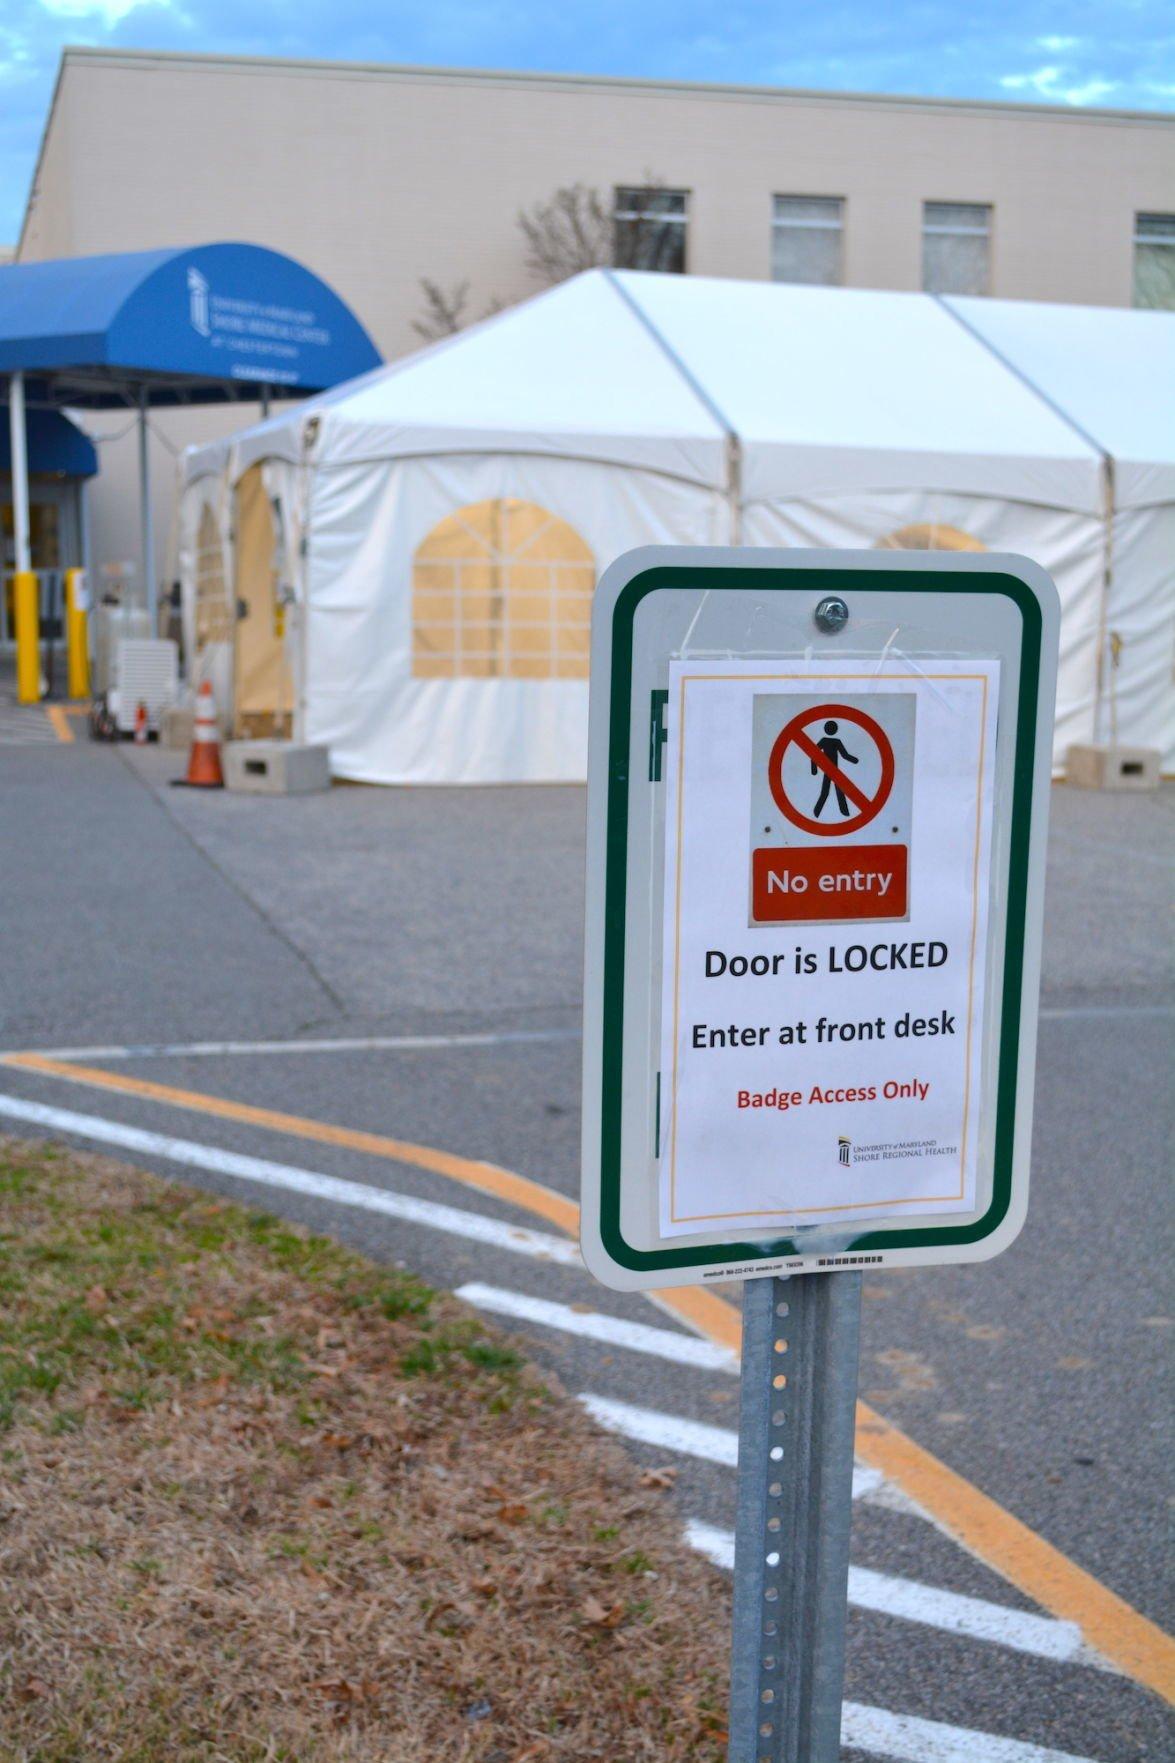 UM Shore Regional Health sets up triage tents as COVID-19 preparedness